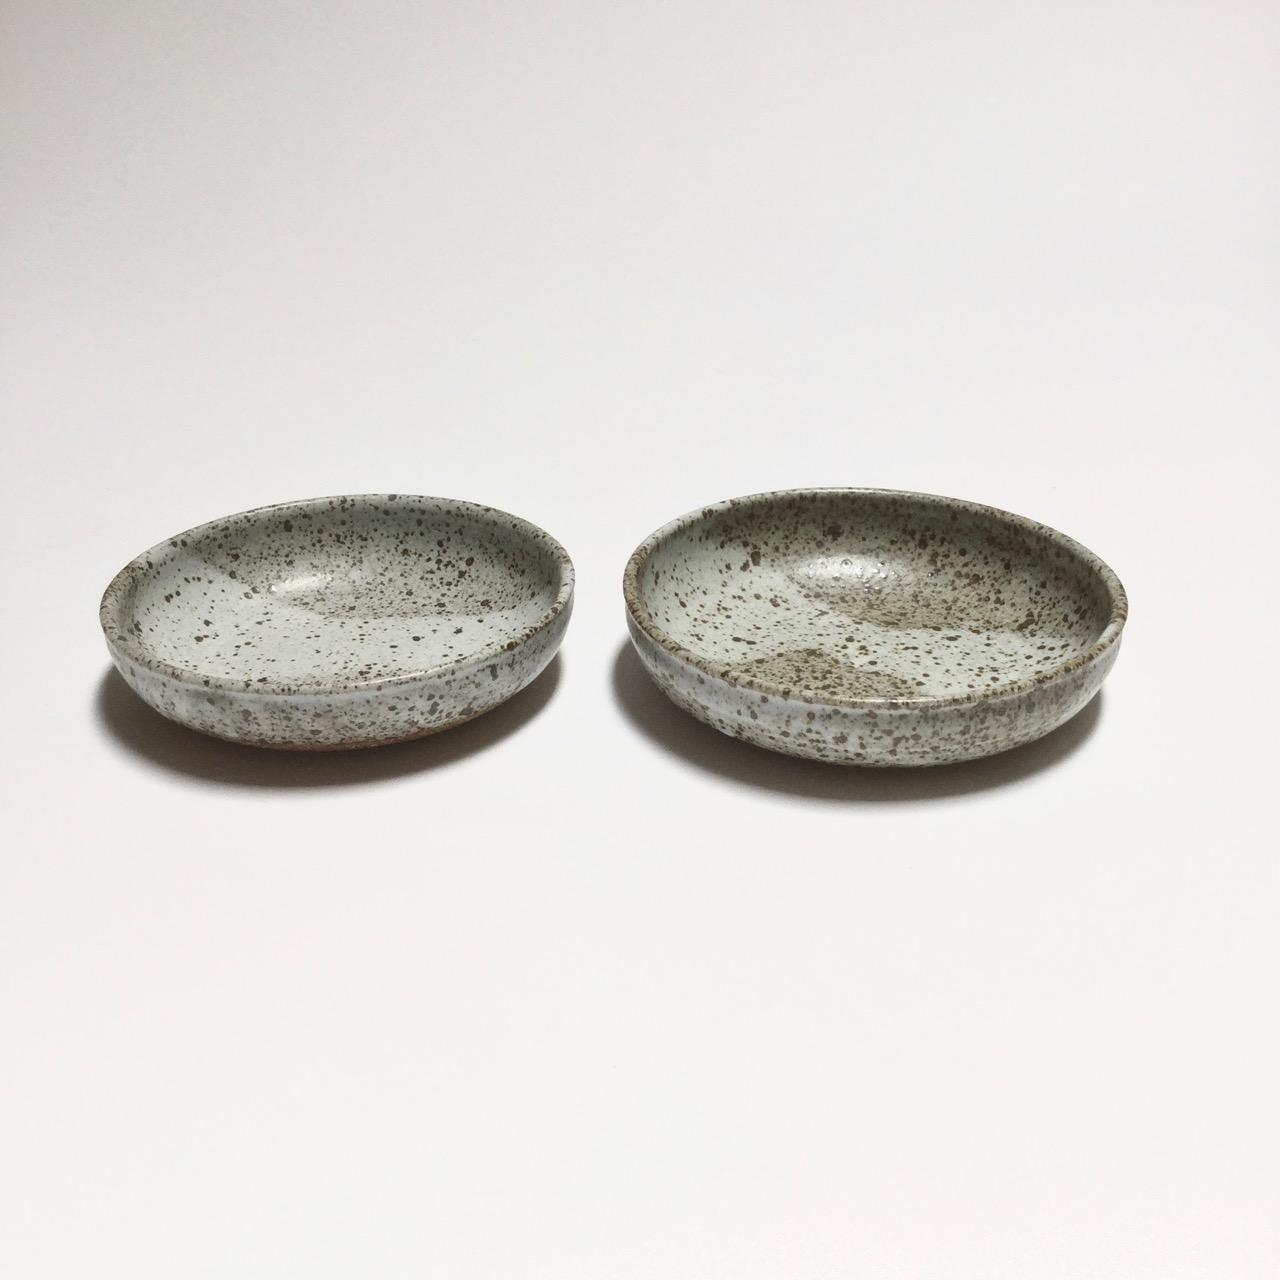 1071 Pair speckled low bowls side.jpg